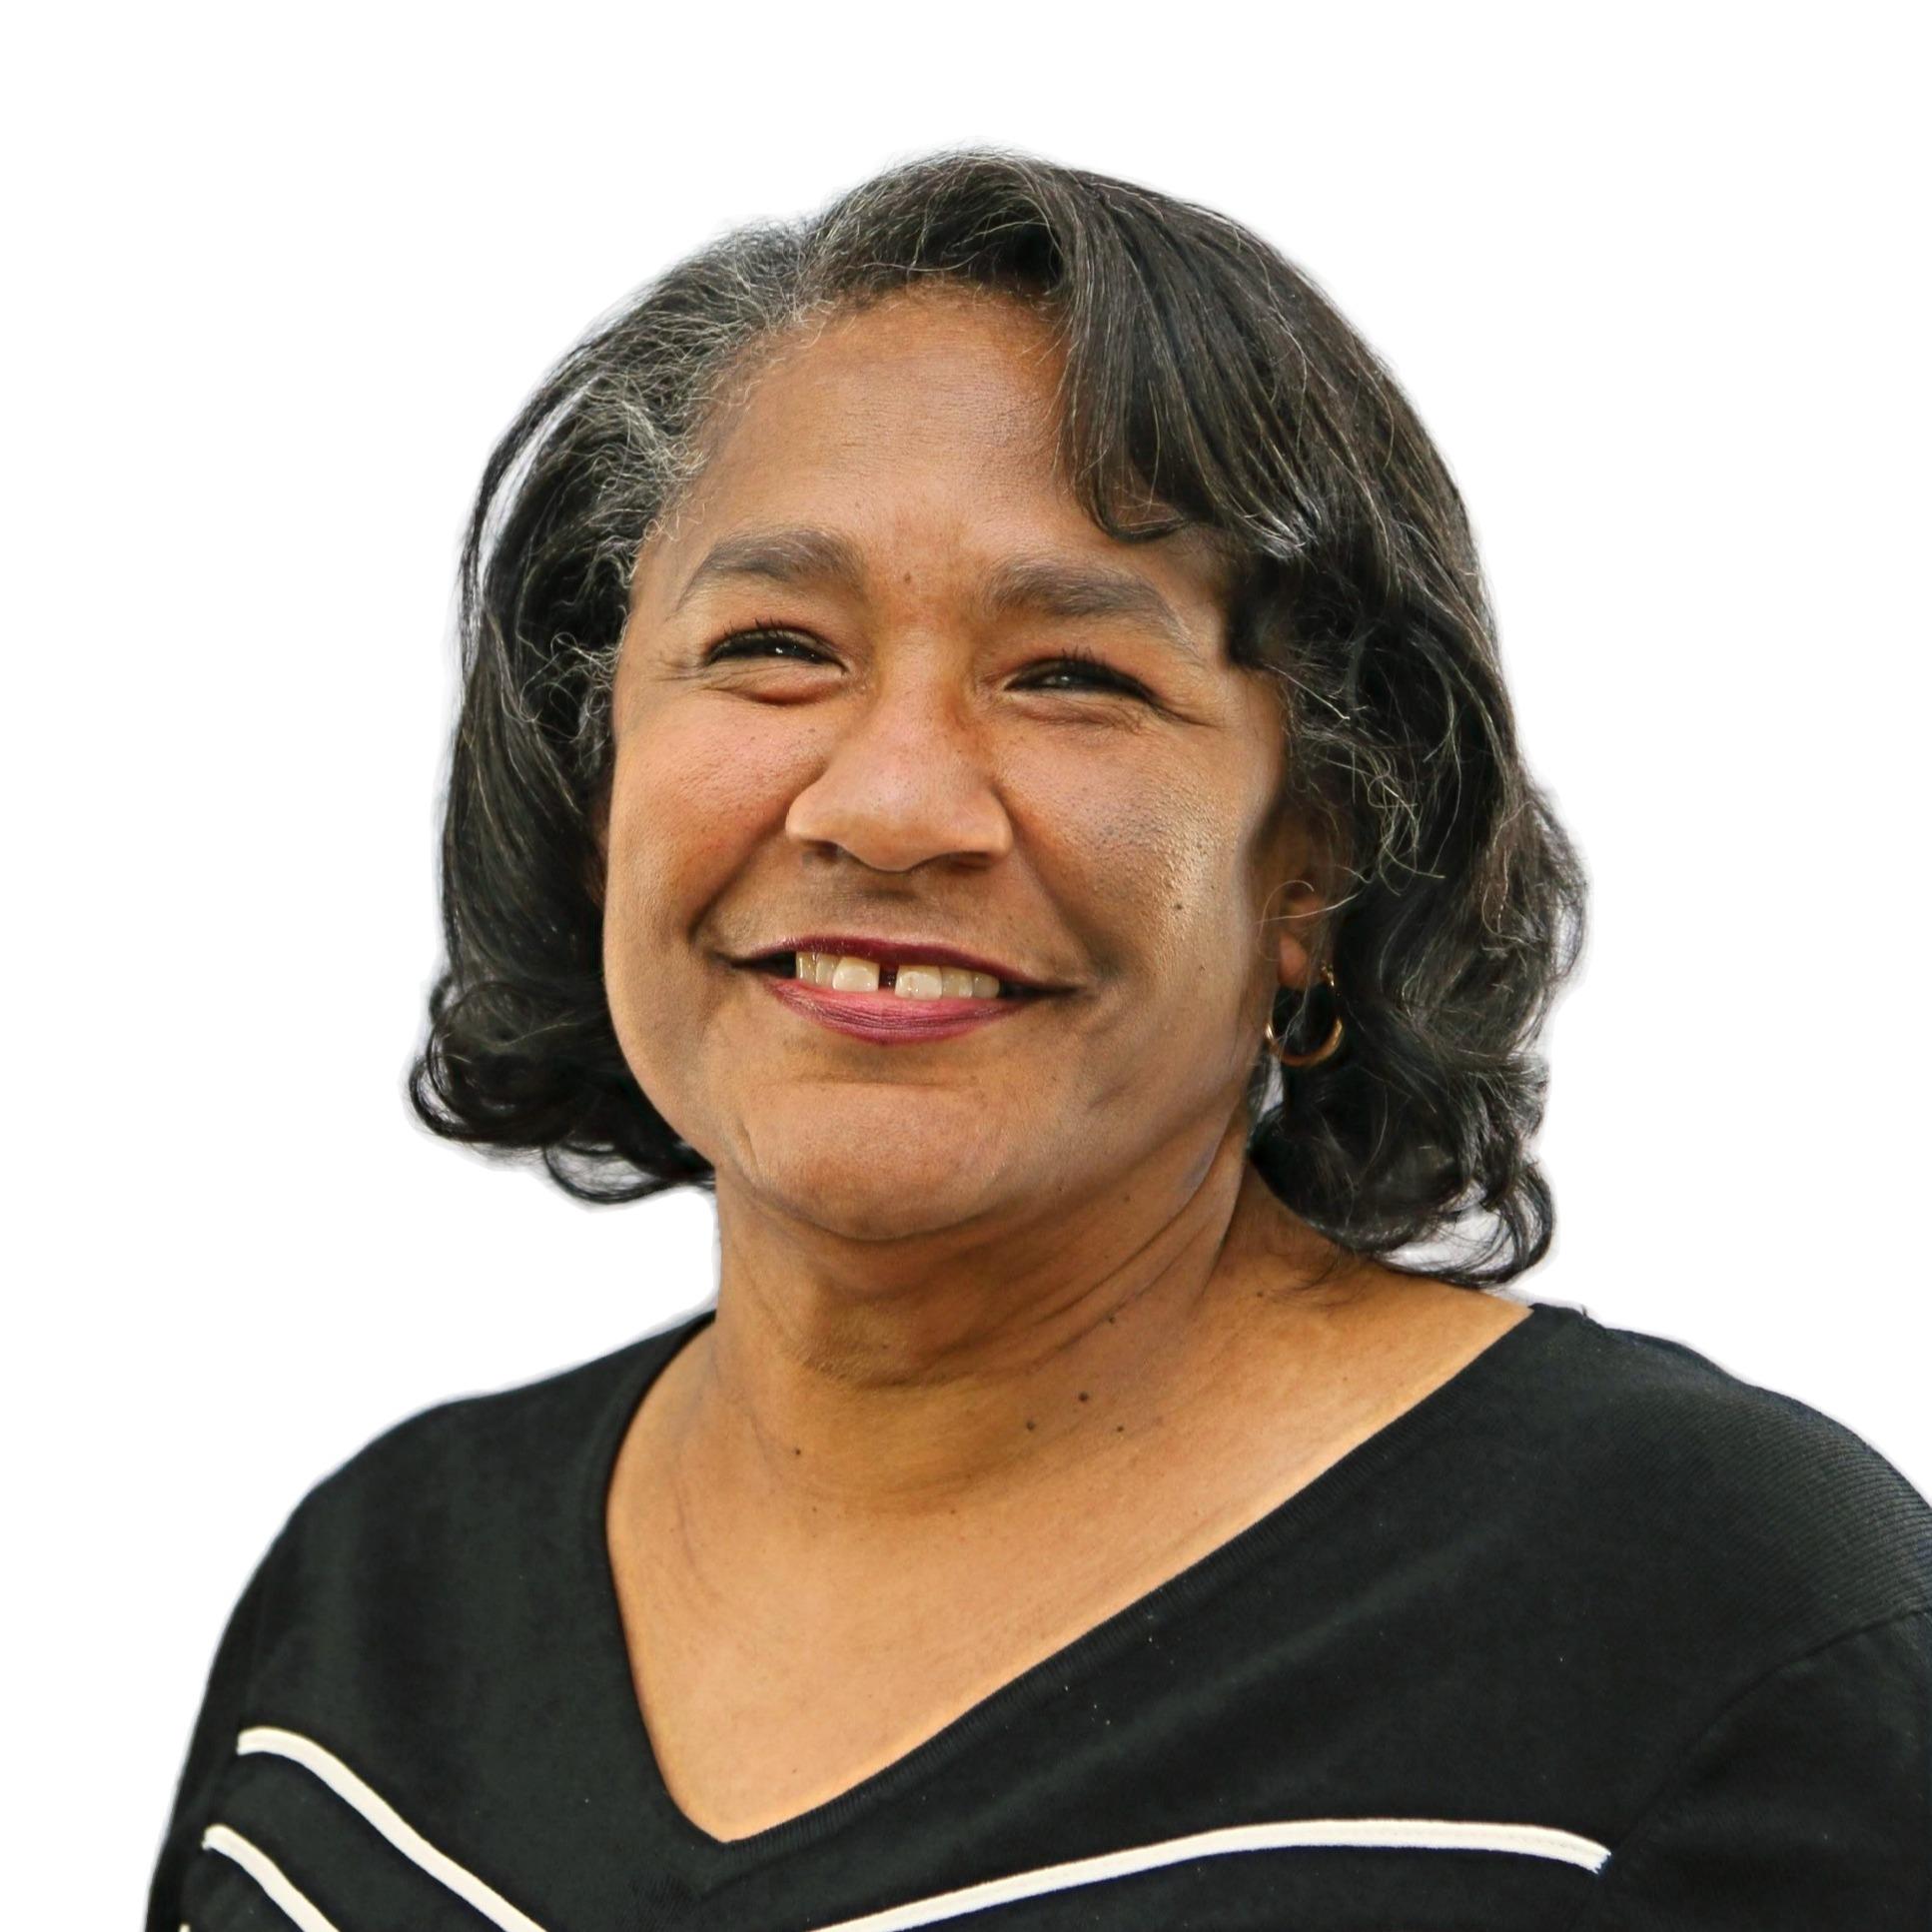 Janice Roberts